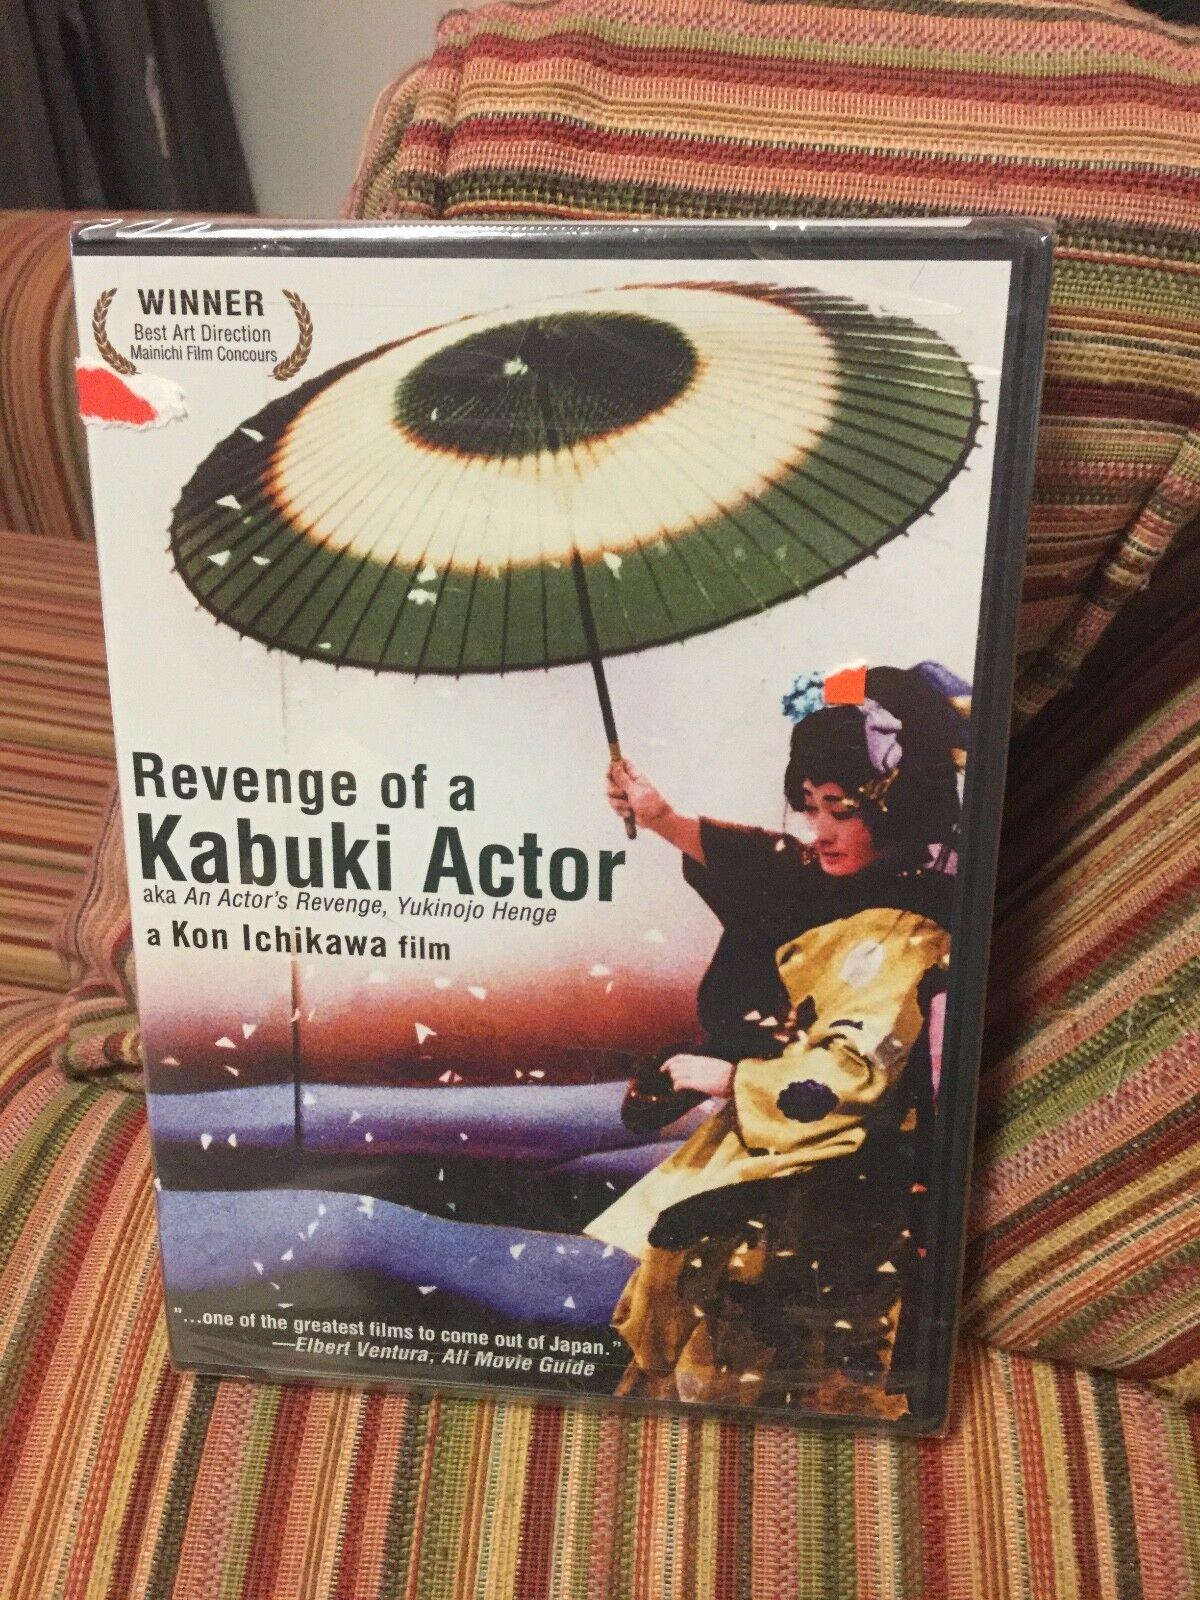 Revenge of a Kabuki Actor (DVD) (NEW) - Kon Ichikawa, Raizo Ishikawa.